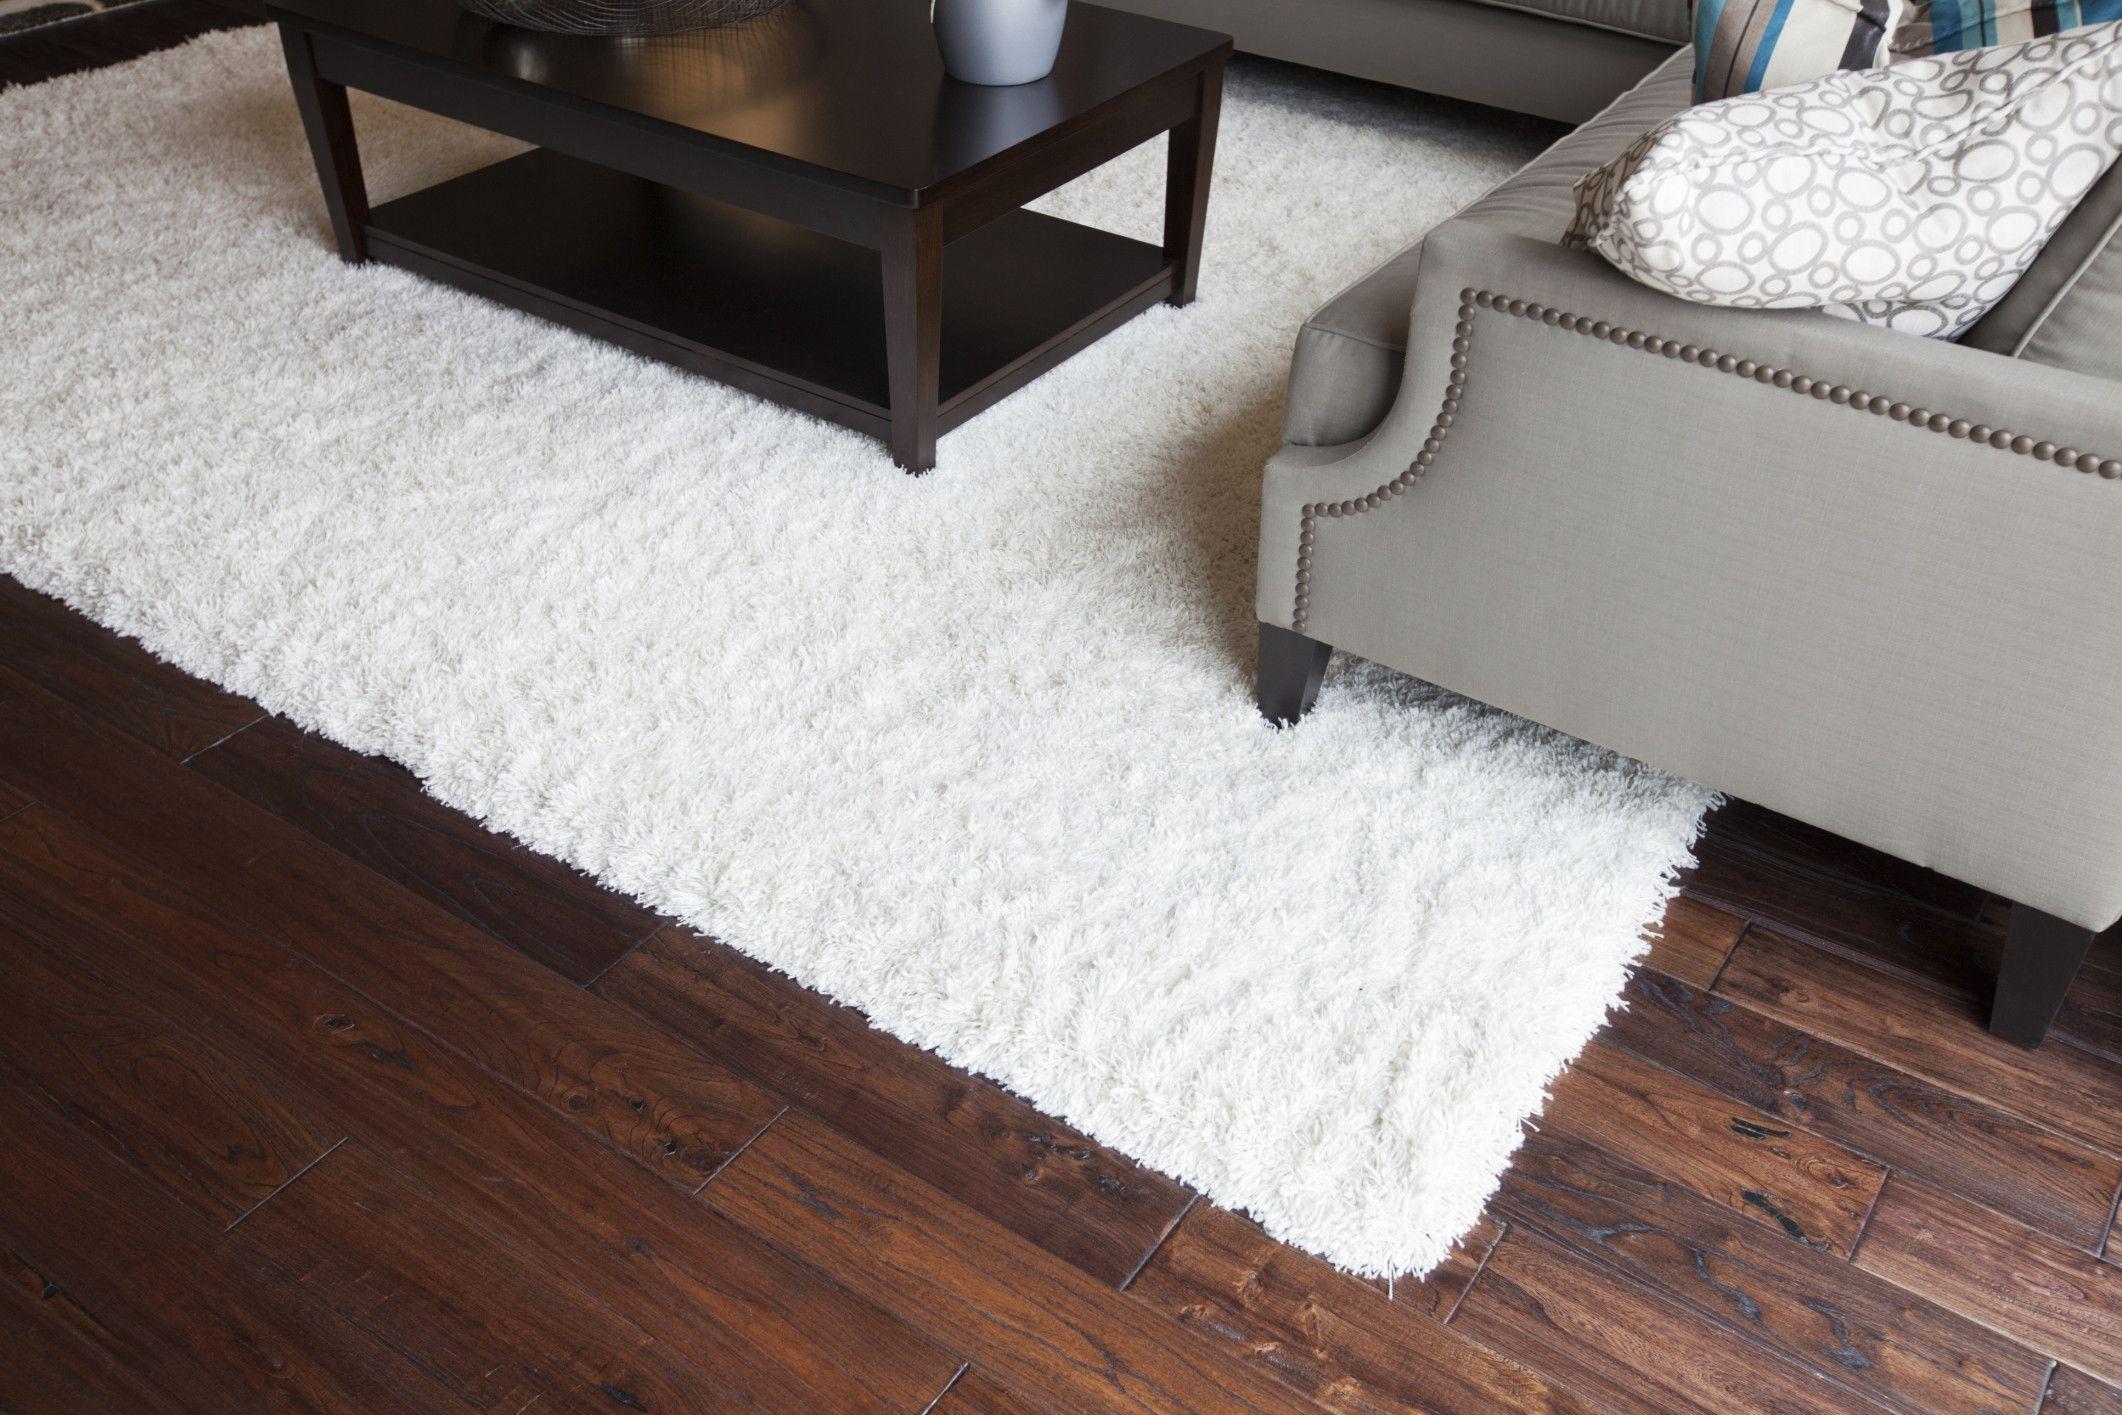 Elegant Putting Furniture On Hardwood Floors Intended For Encourage Wood Floor Kitchenkitchen Rugkitchen Floorsbest